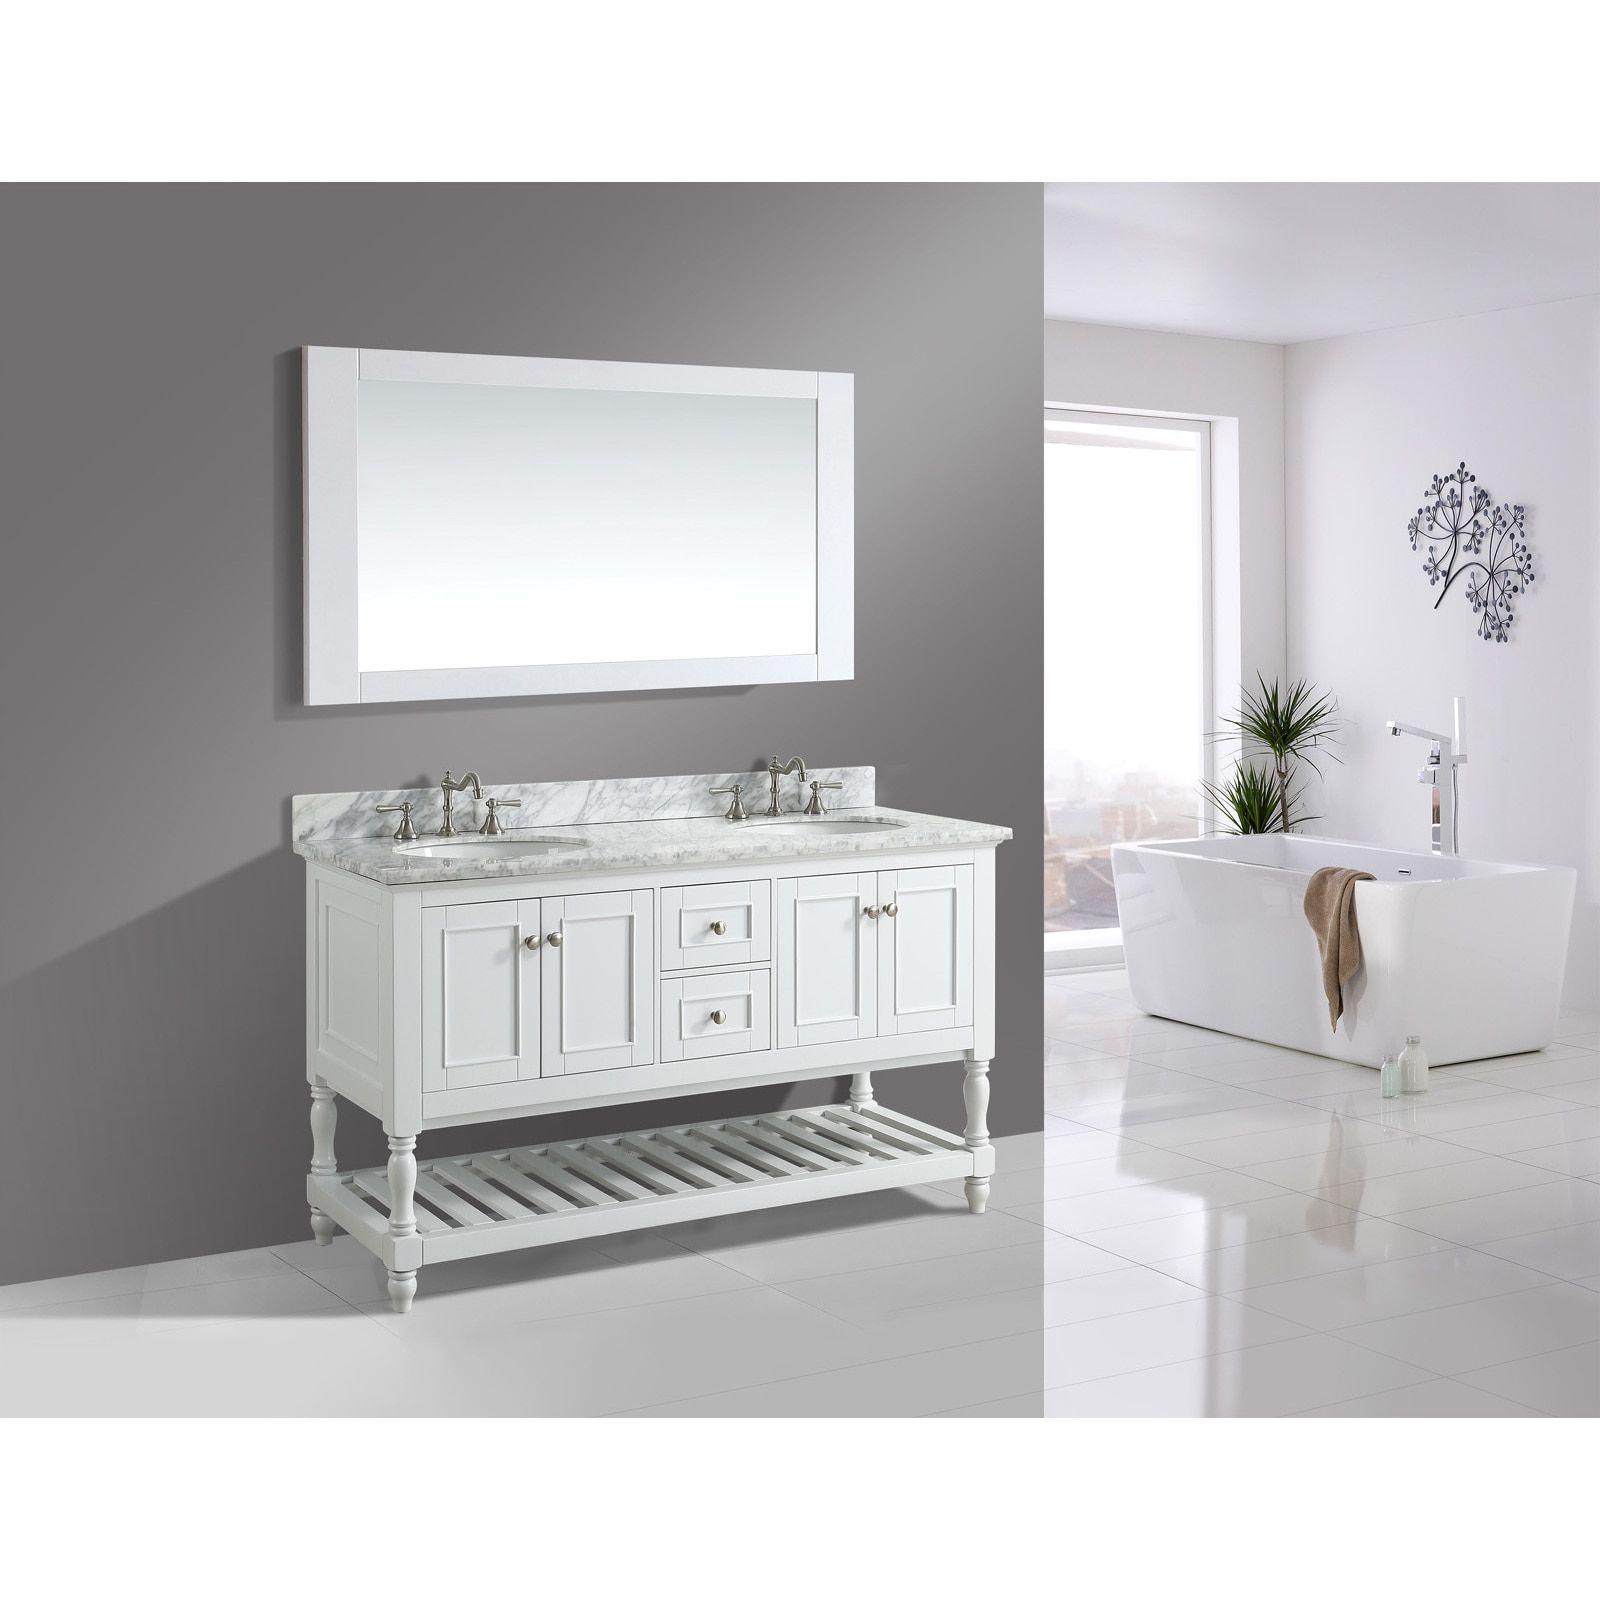 Silvia\' 60-inch Bathroom Sink Vanity Set with White Marble Top ...